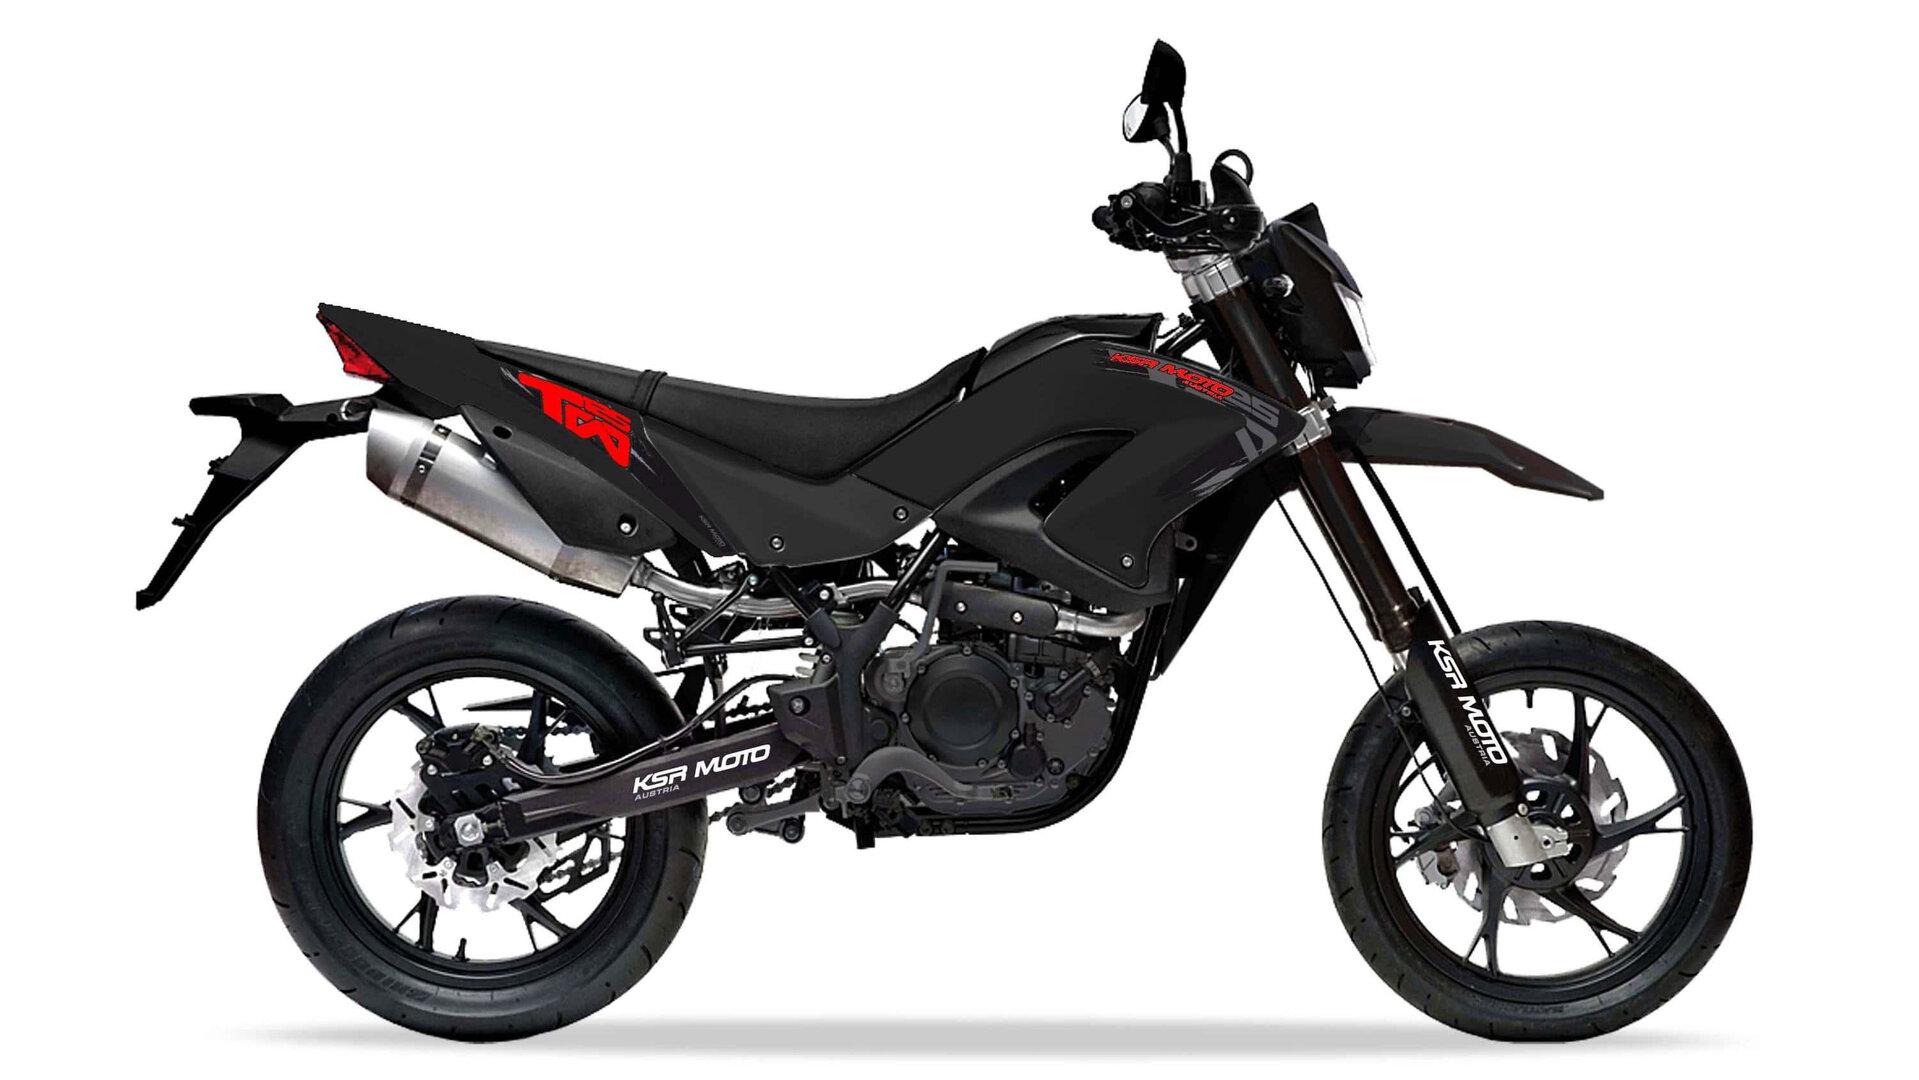 Moto del día: KSR MOTO TW 125 X/SM